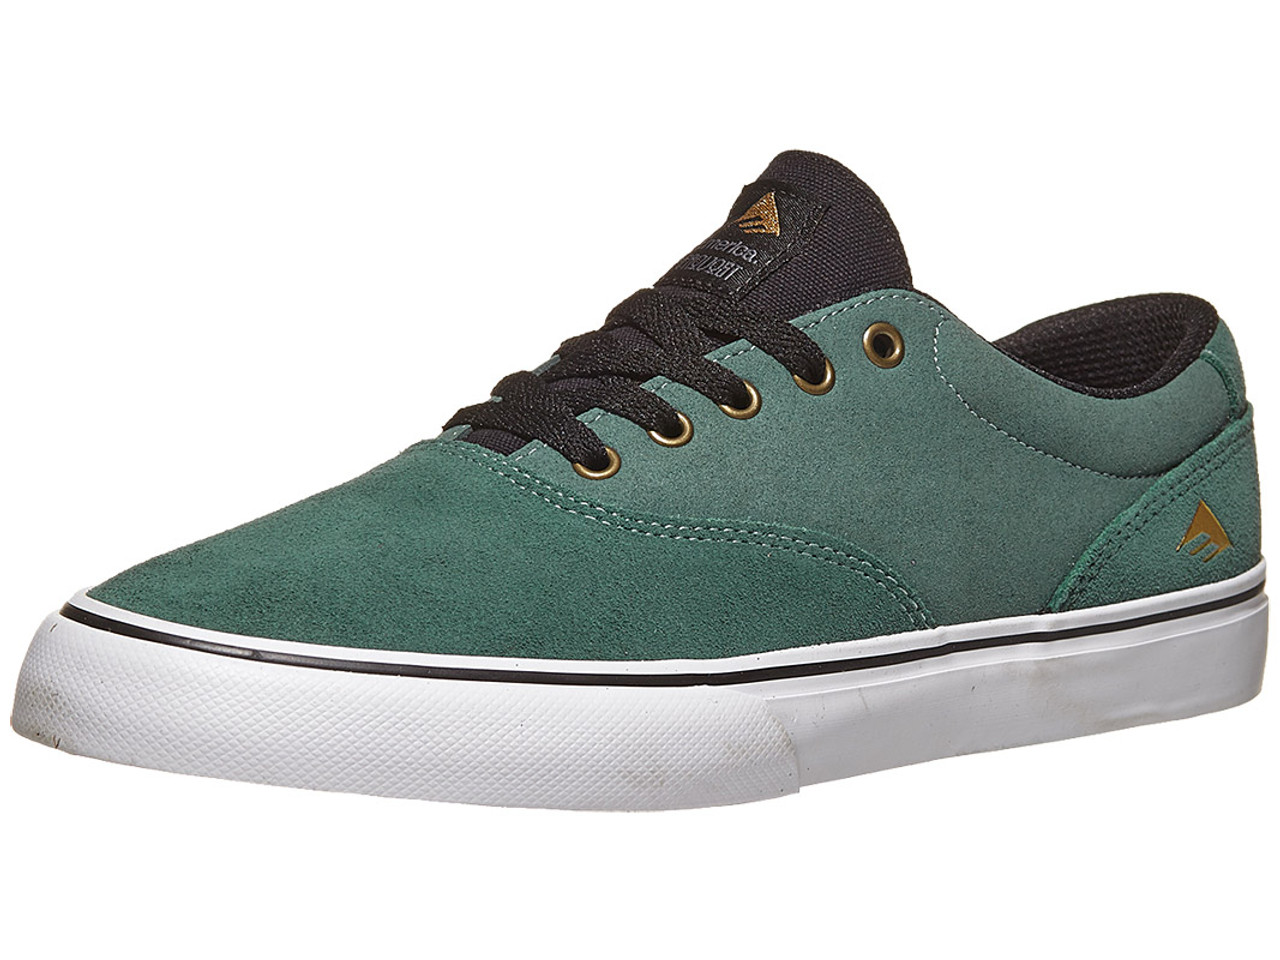 Emerica Provost Slim Vulc Skate Shoes